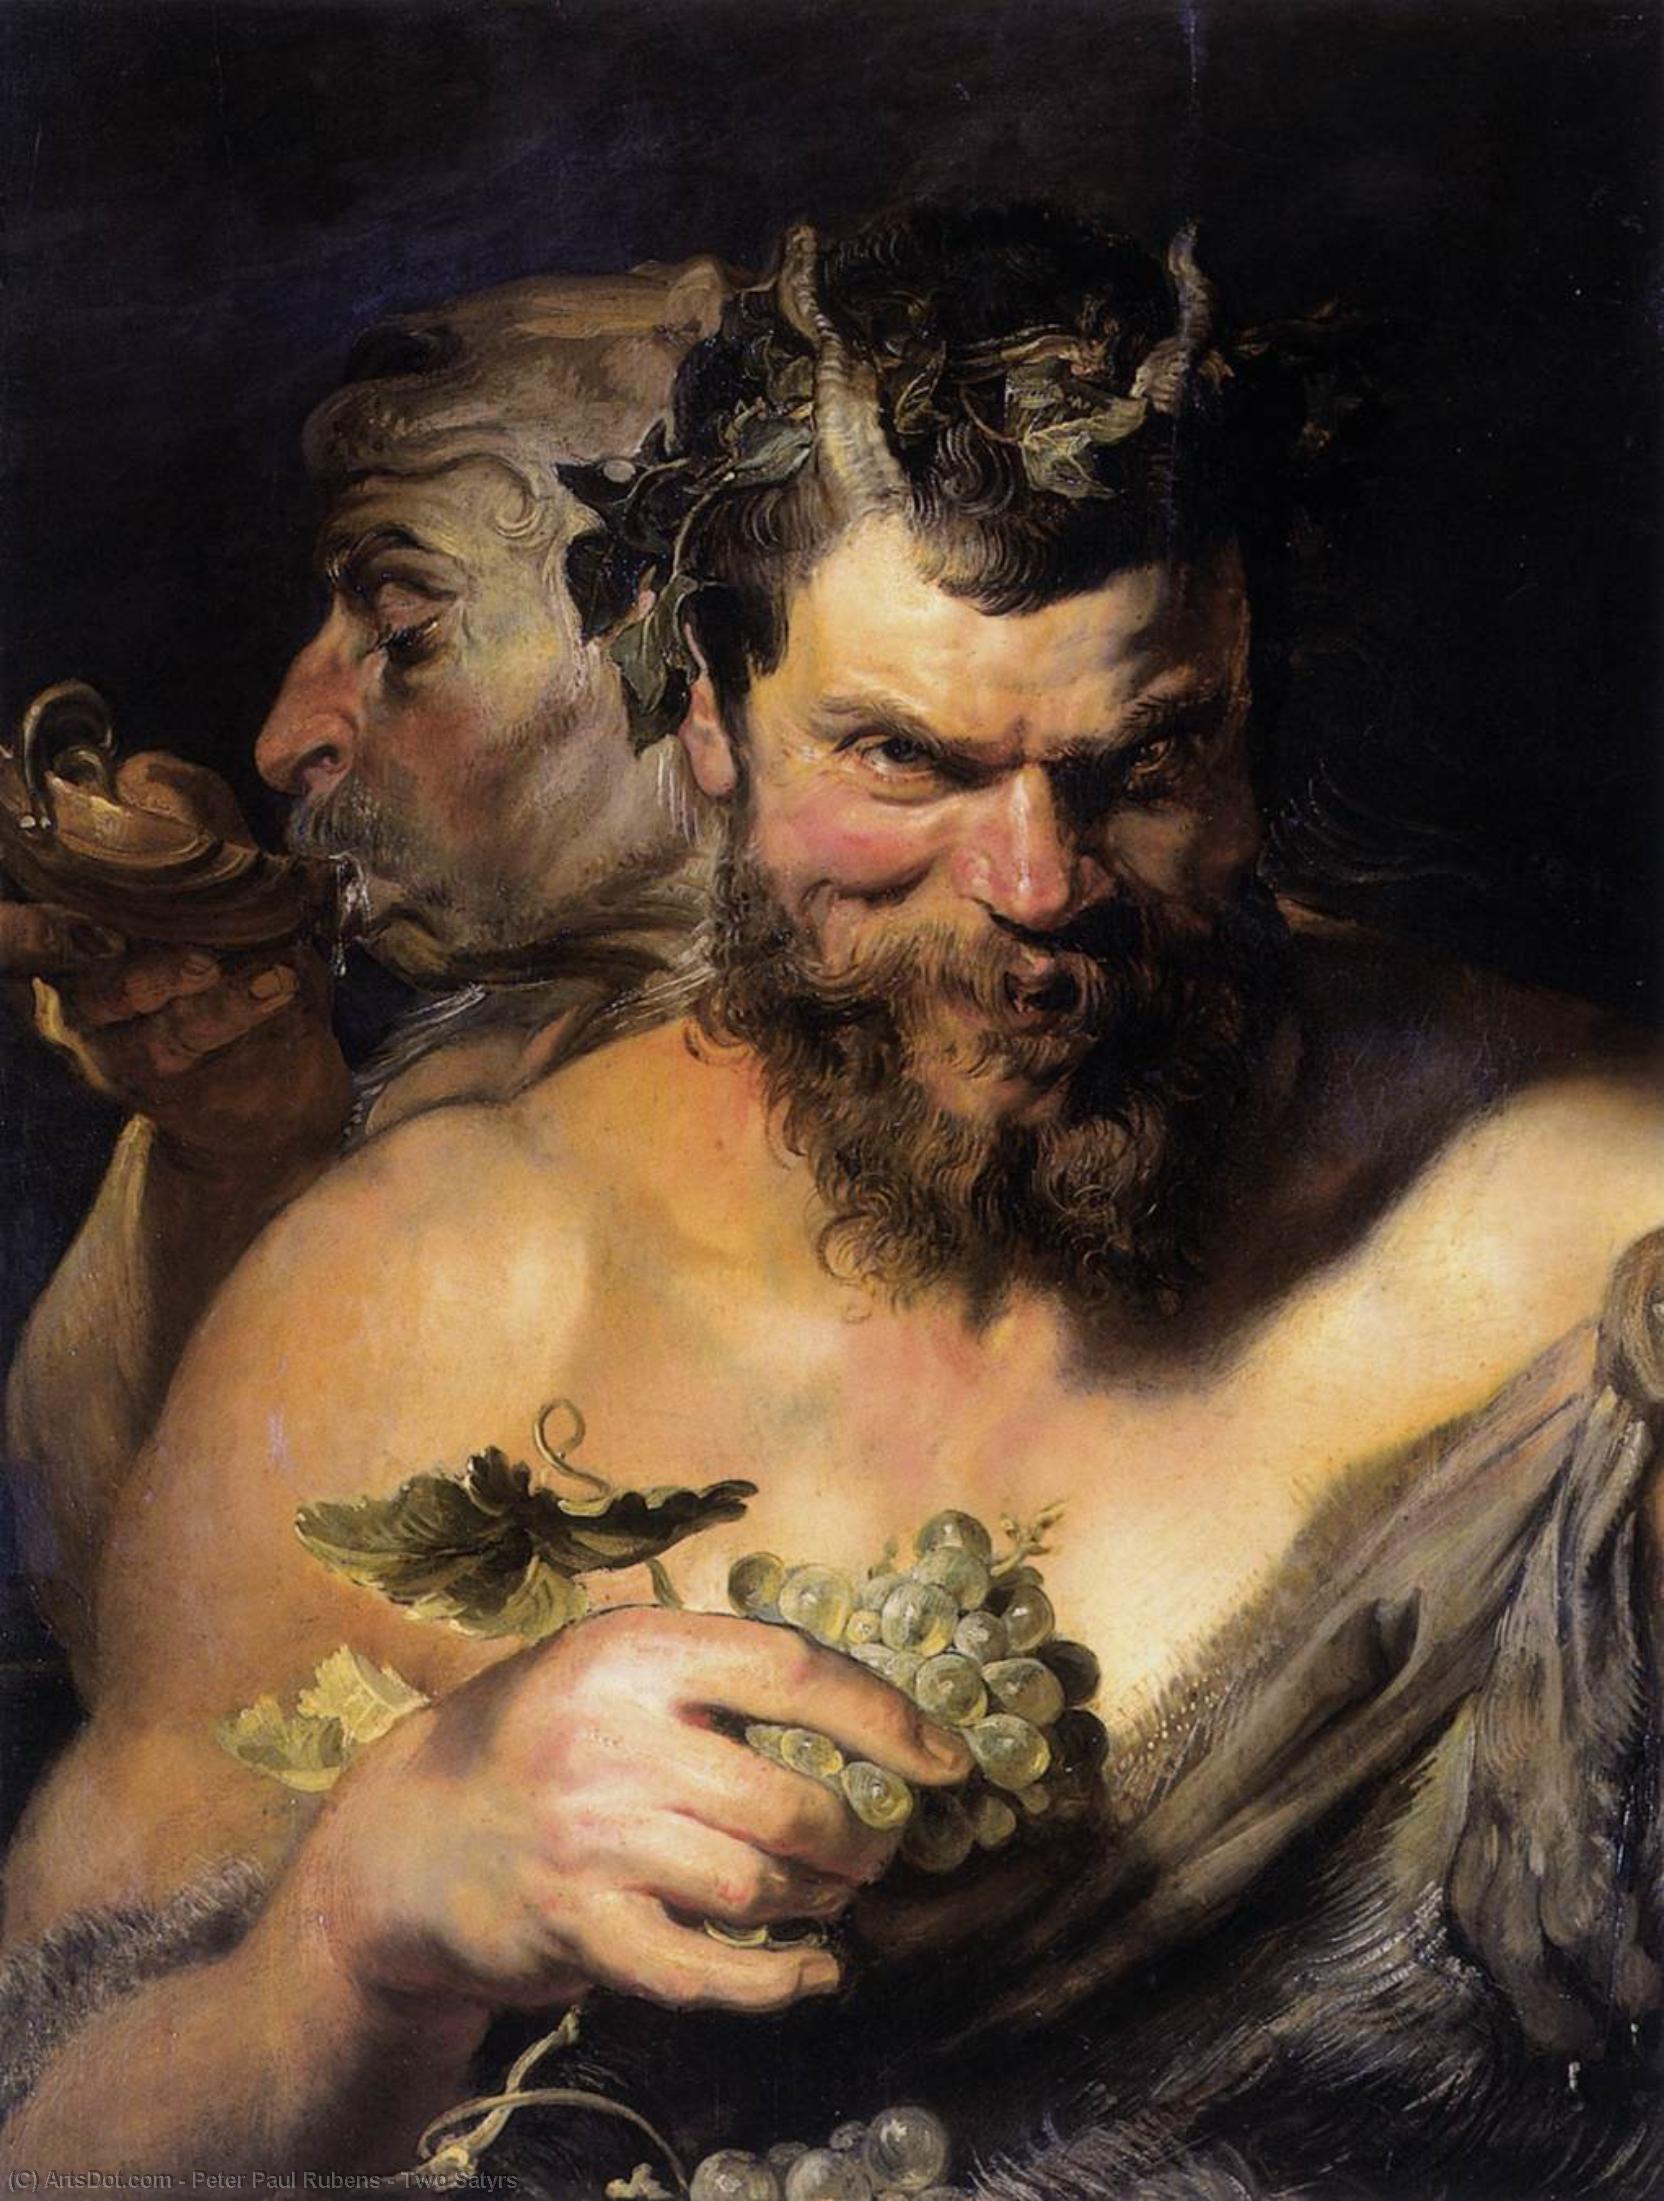 WikiOO.org - Encyclopedia of Fine Arts - Malba, Artwork Peter Paul Rubens - Two Satyrs